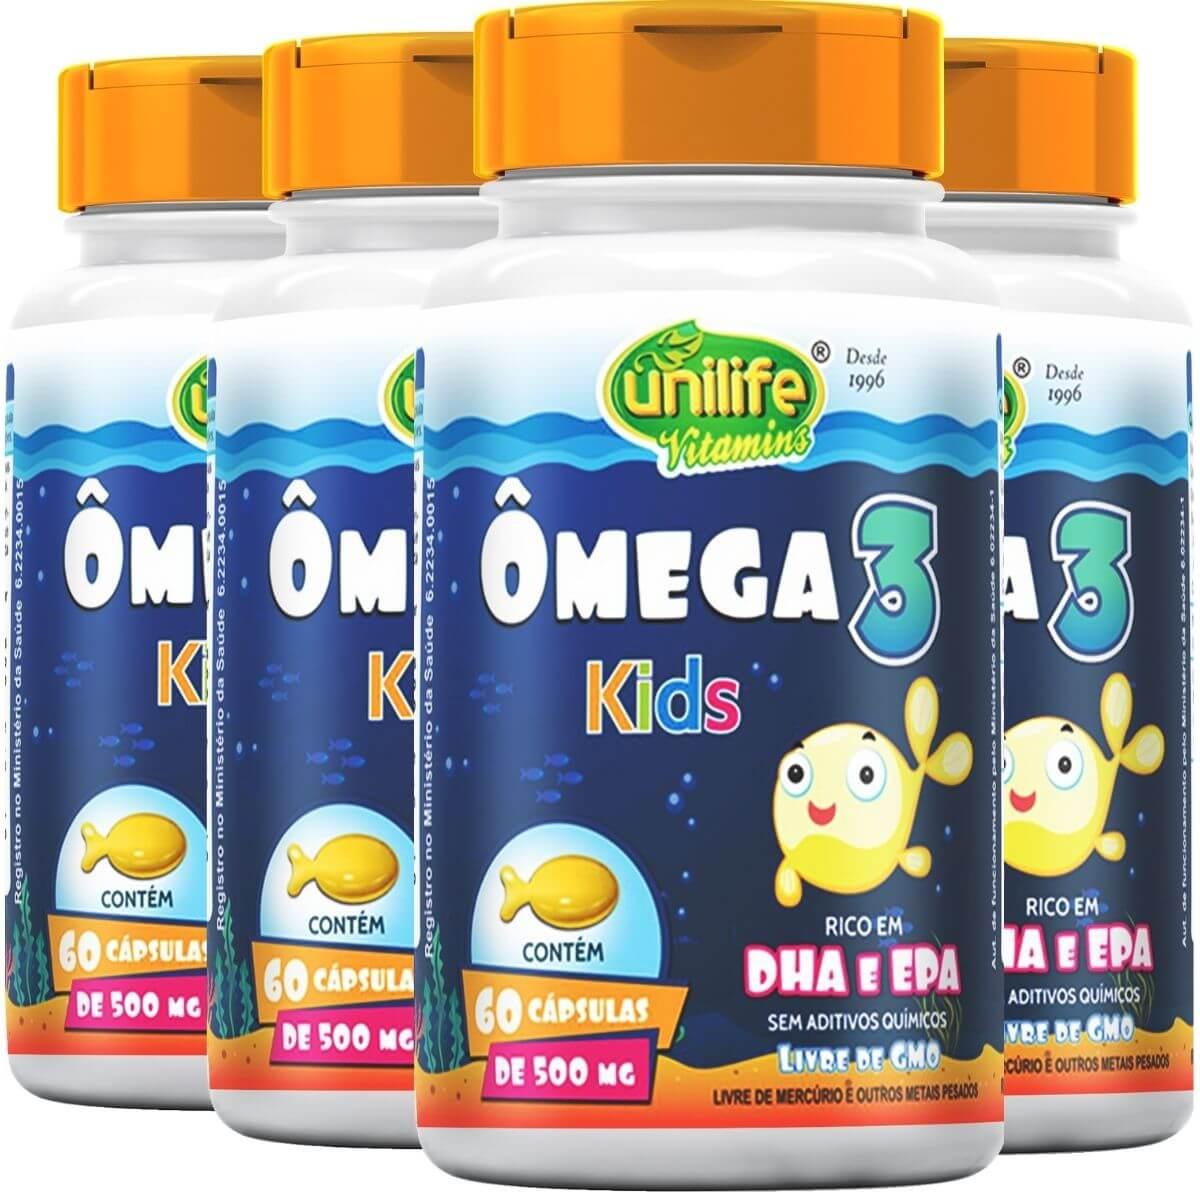 Kit 4 Ômega 3 Kids Unilife 60 Cápsulas 500mg